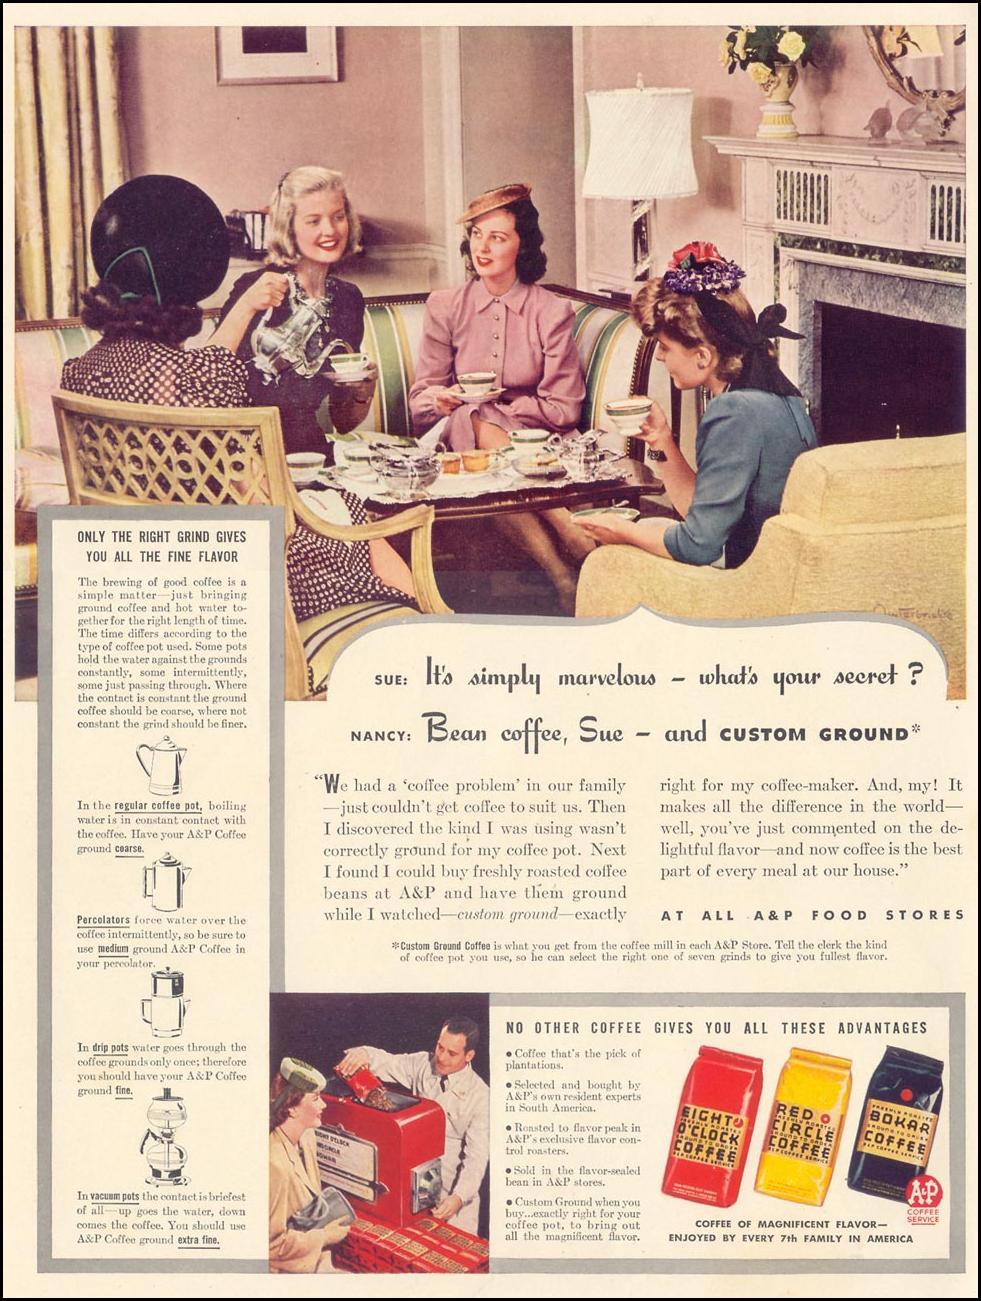 BOKAR COFFEE LIFE 09/30/1940